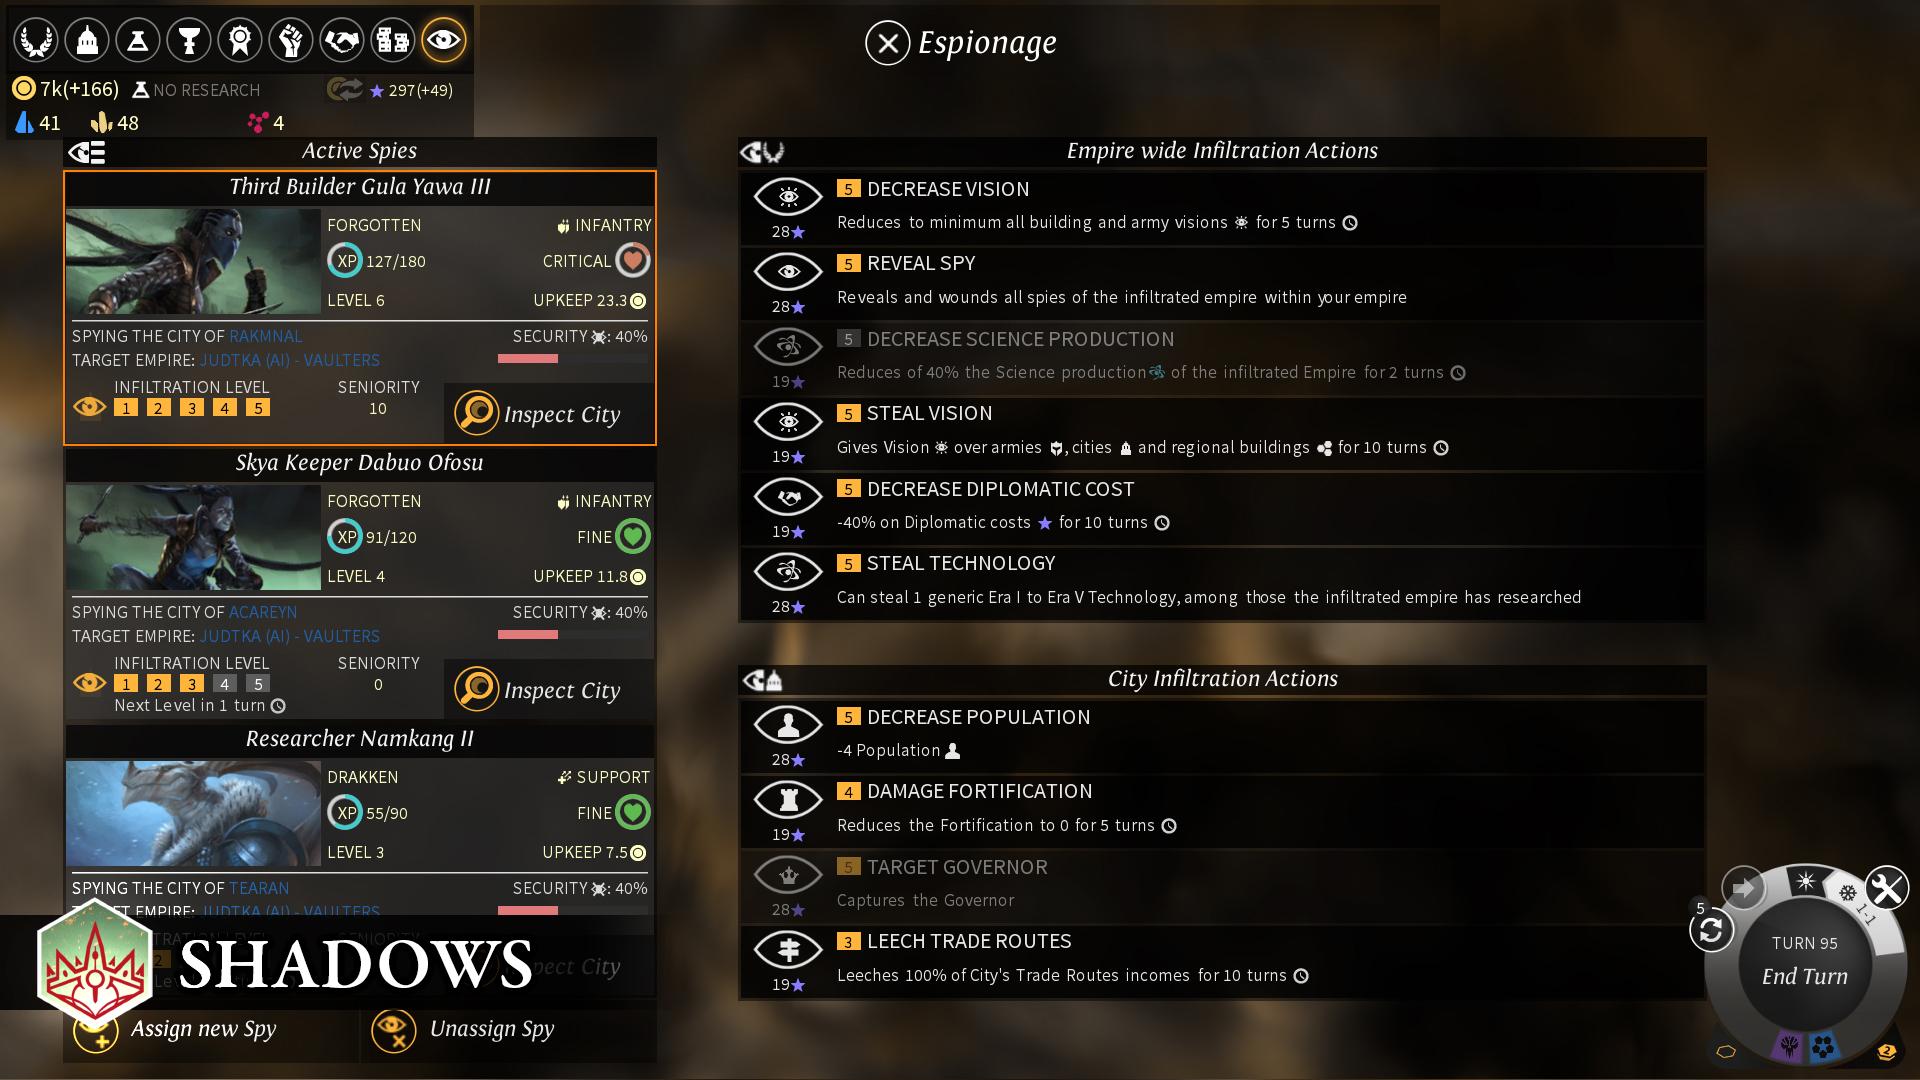 Endless Legend™ - Shadows PC Key Fiyatları